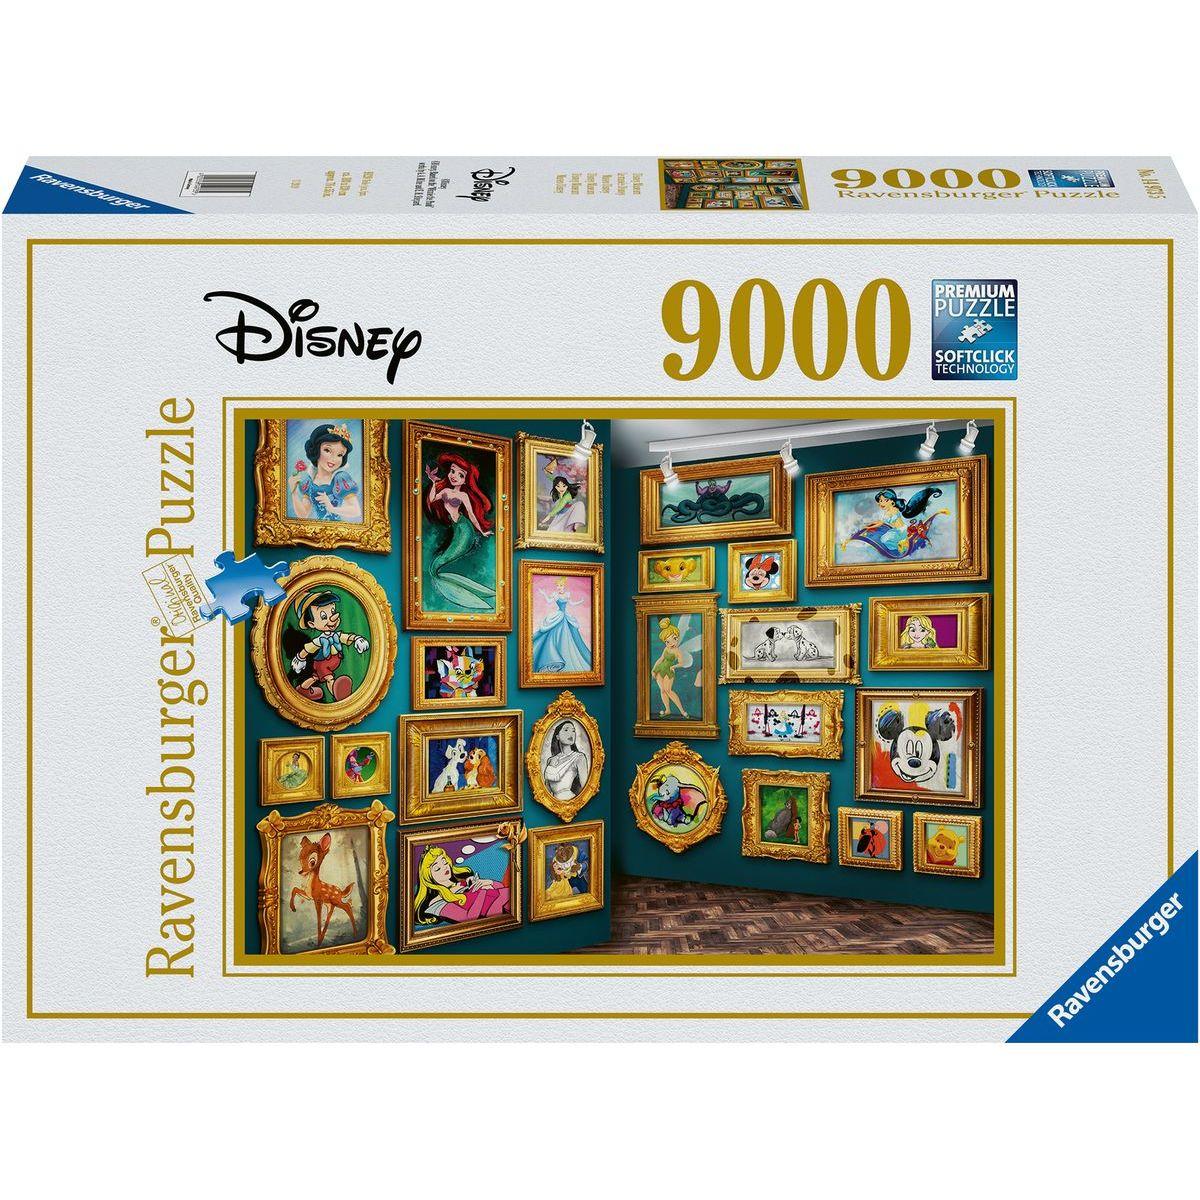 Ravensburger puzzle 149735 Disney múzeum 9000 dielikov